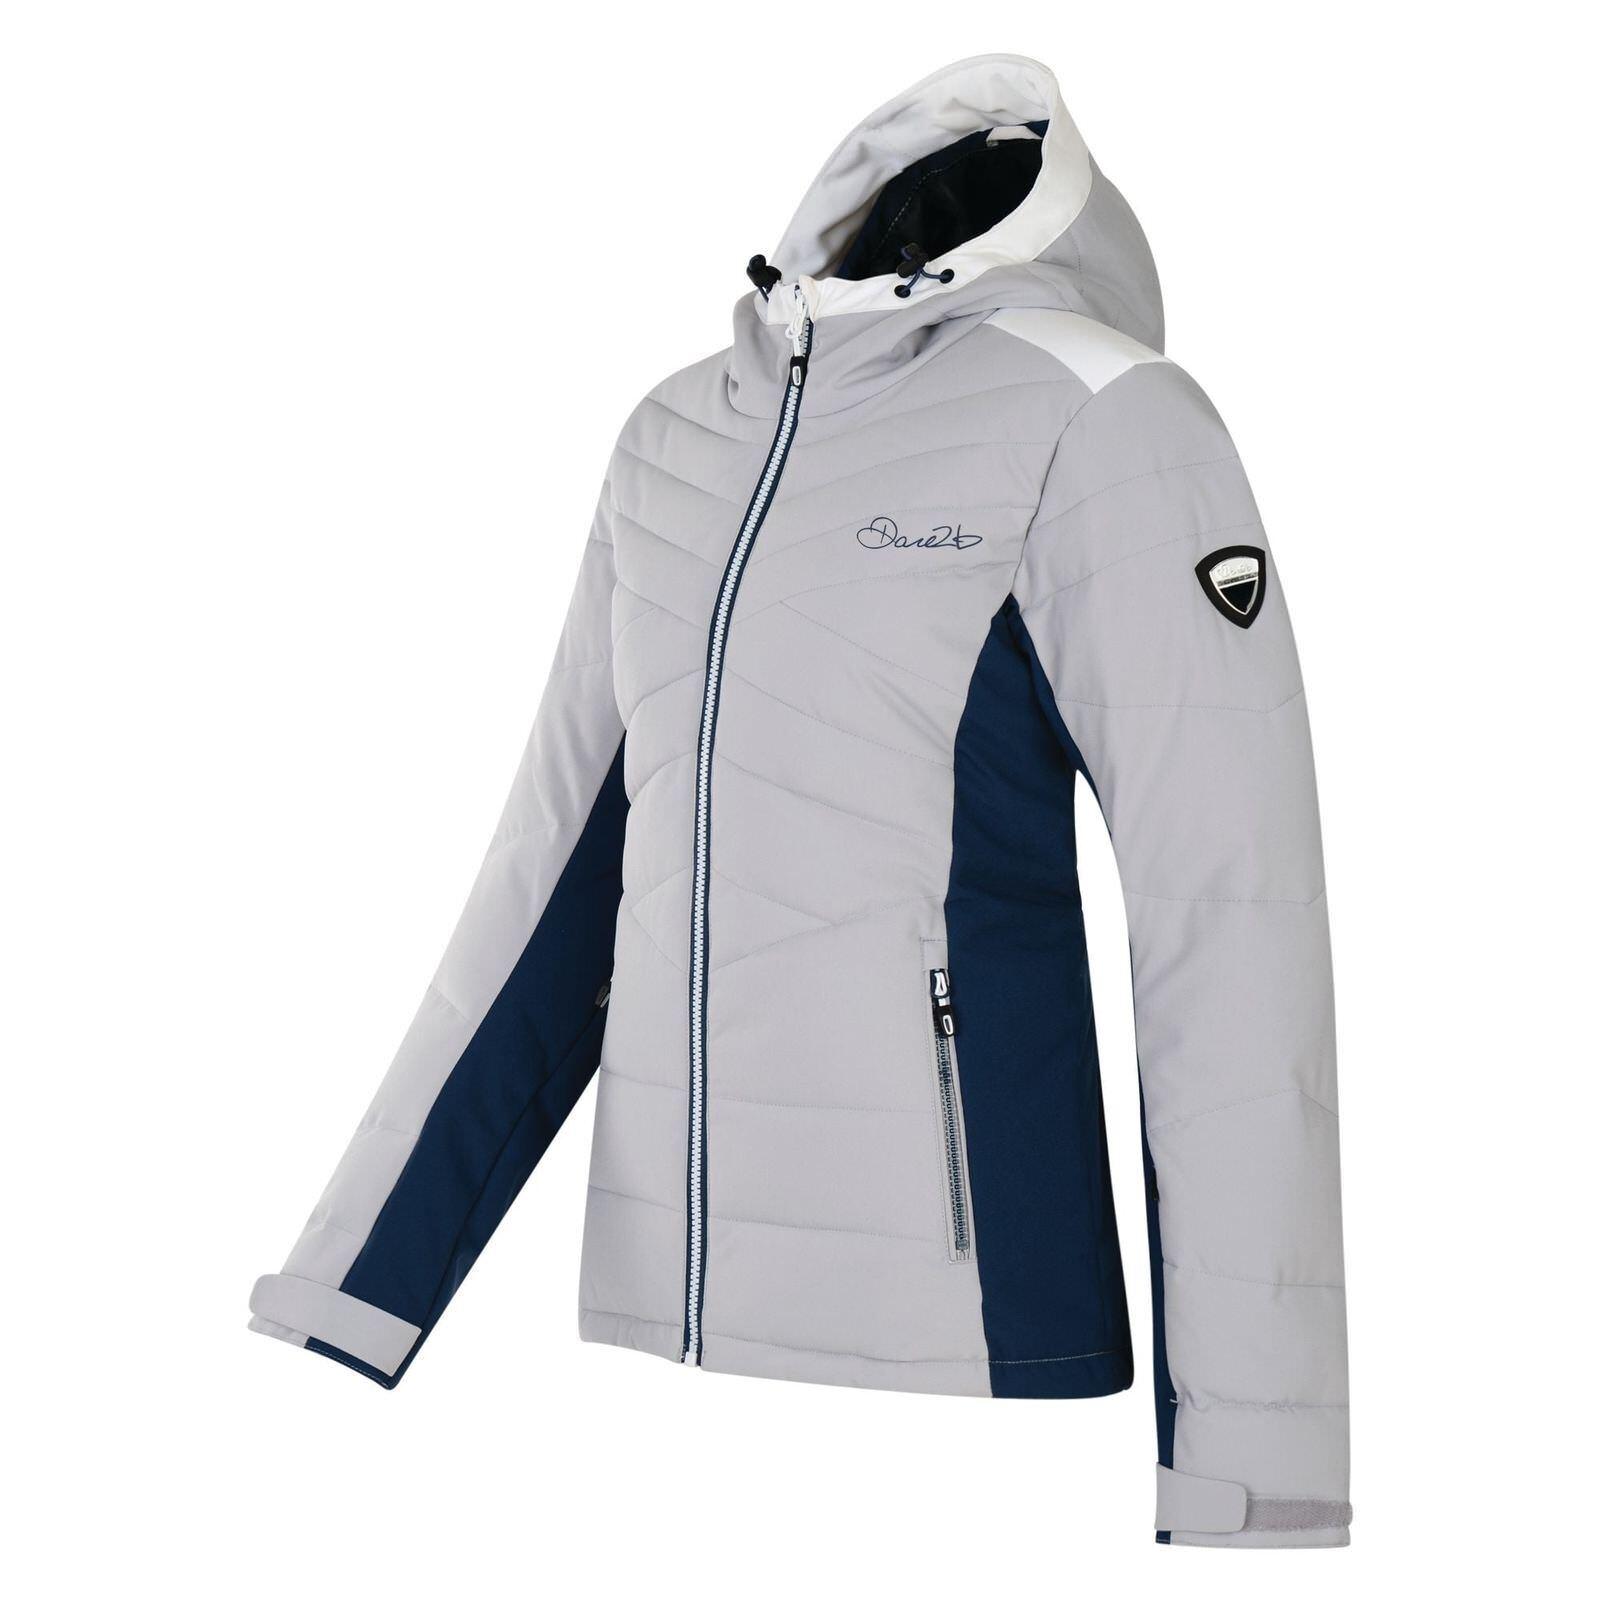 Dare 2b Womens ladies ILLATION II Waterproof Insulated Ski Jacket 12 ... f6085bc0c